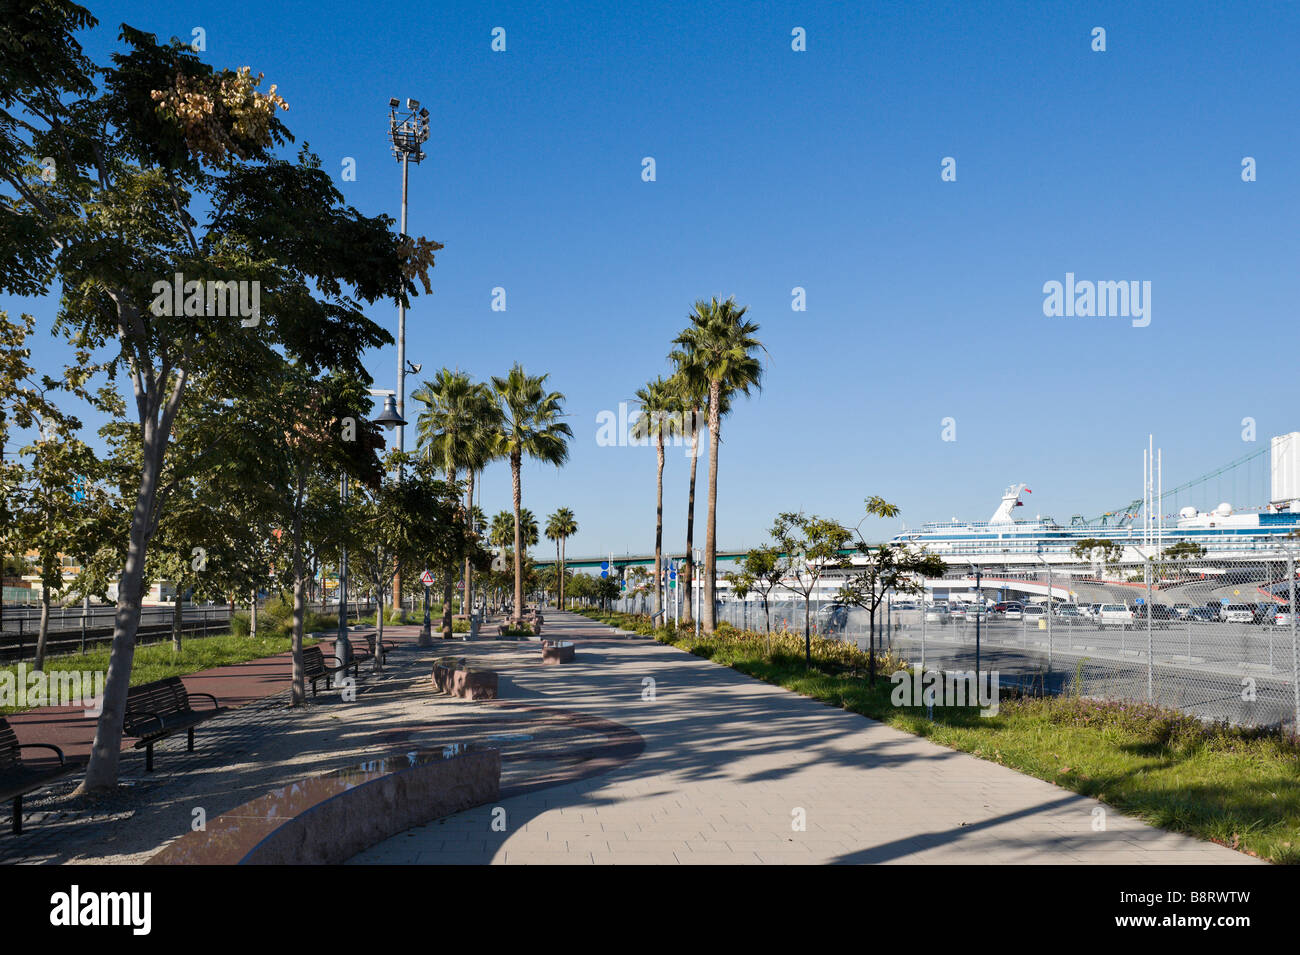 Promenade near the Cruise Terminal, Port of Los Angeles, San Pedro, Los Angeles, California, USA - Stock Image